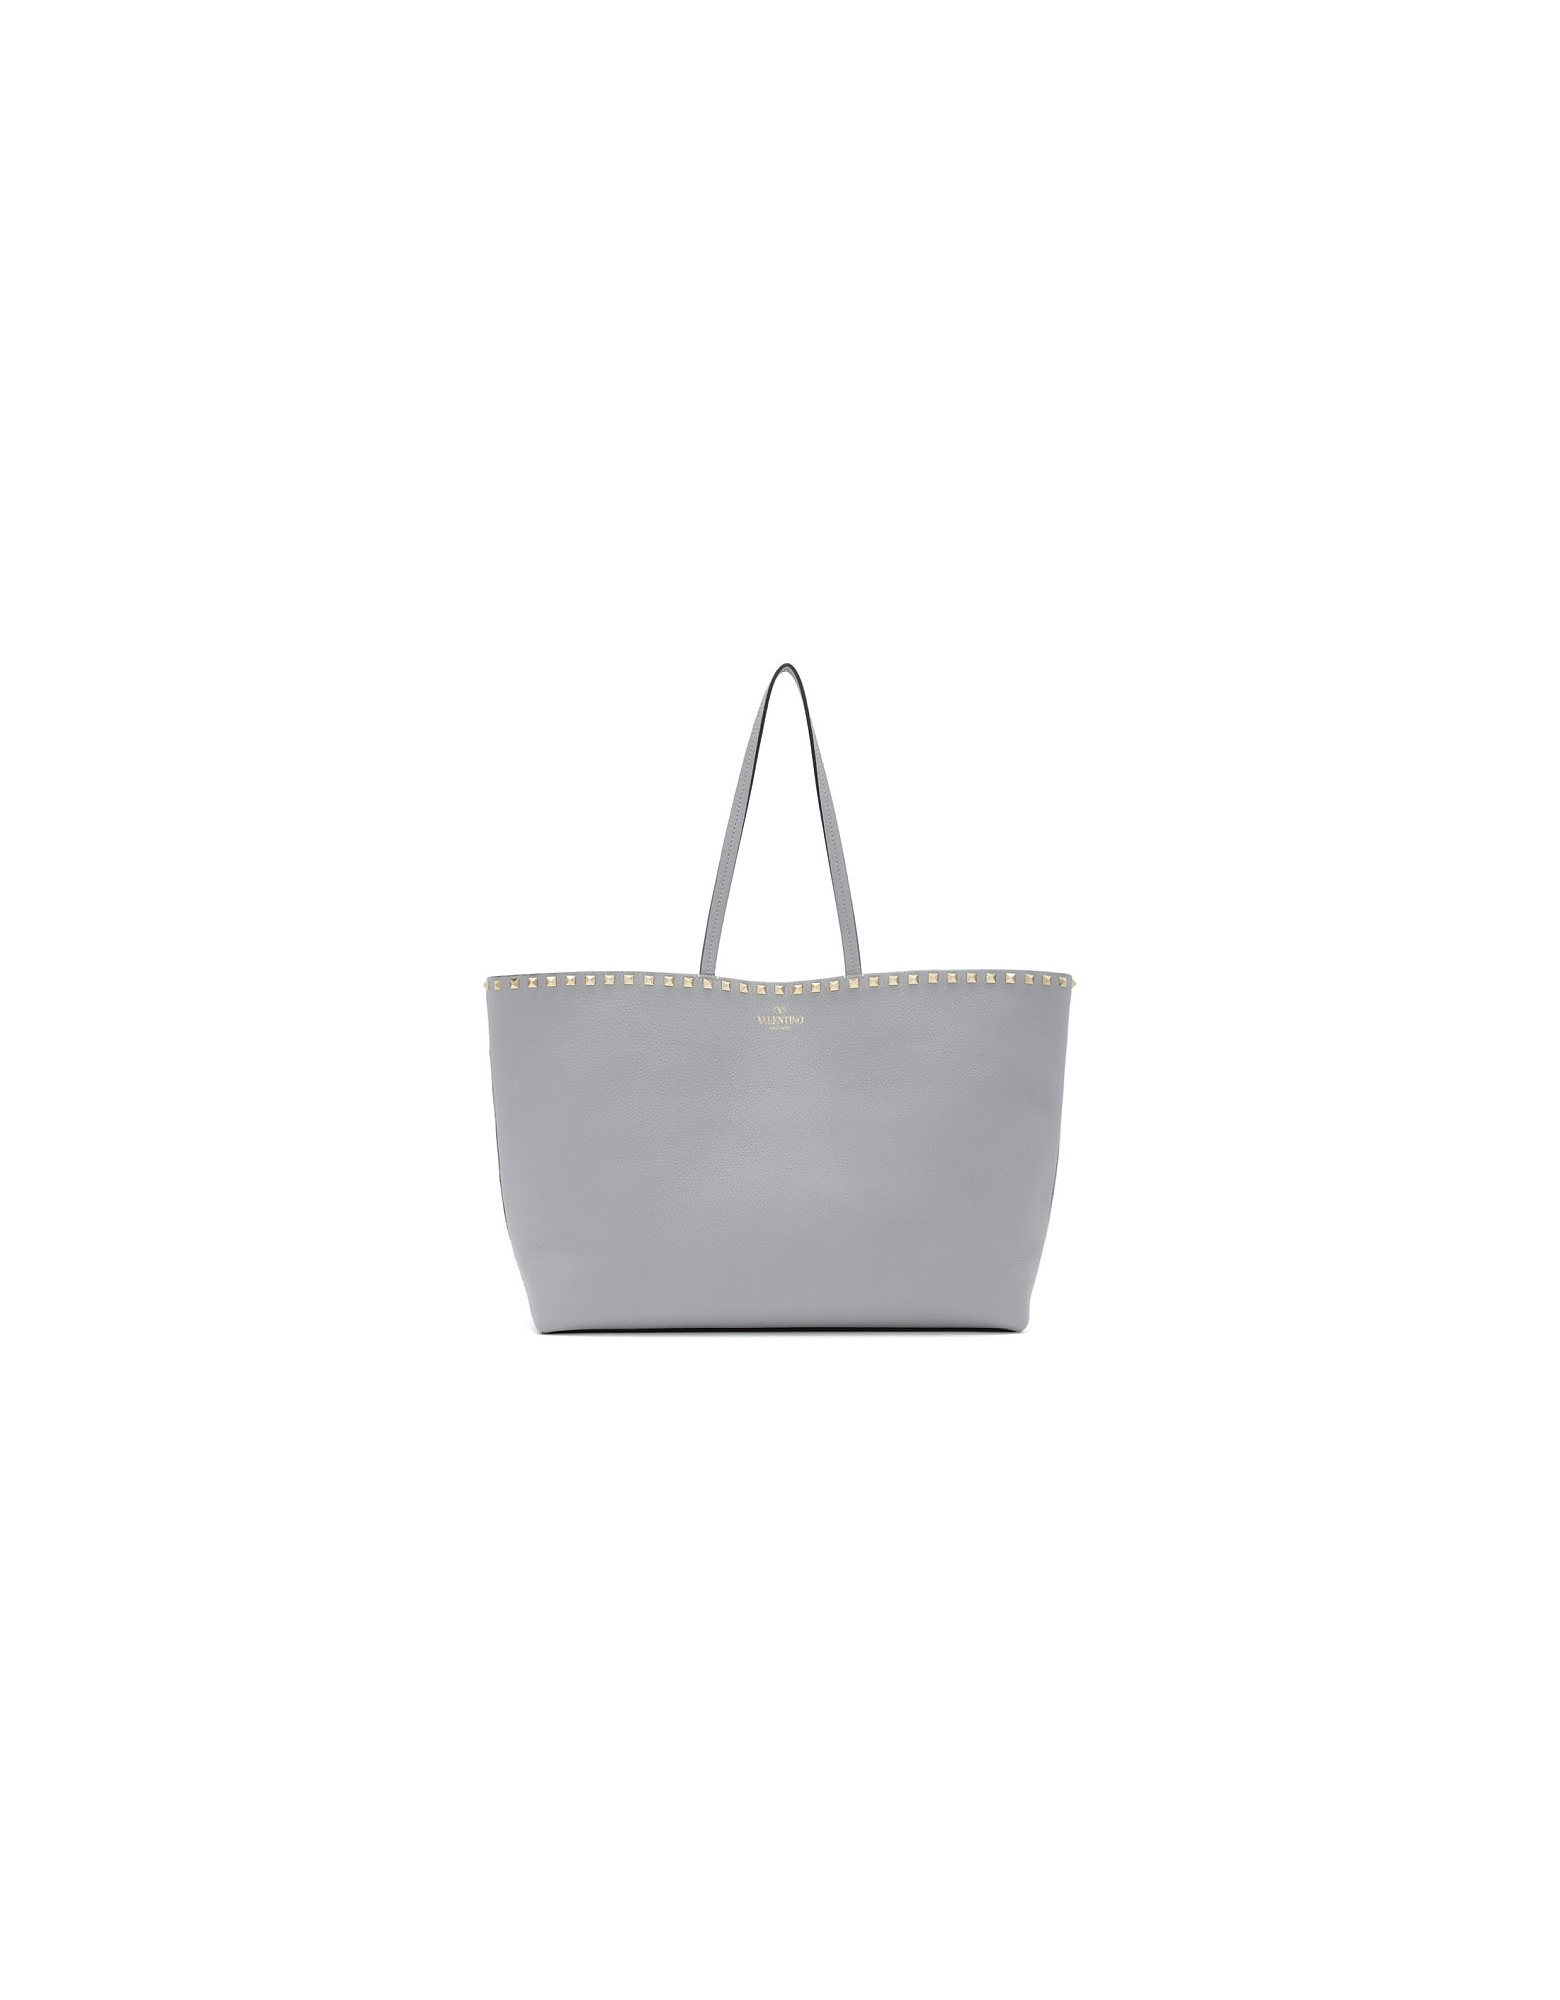 Valentino Designer Handbags, Grey Valentino Garavani Small Rockstud Shopper Tote